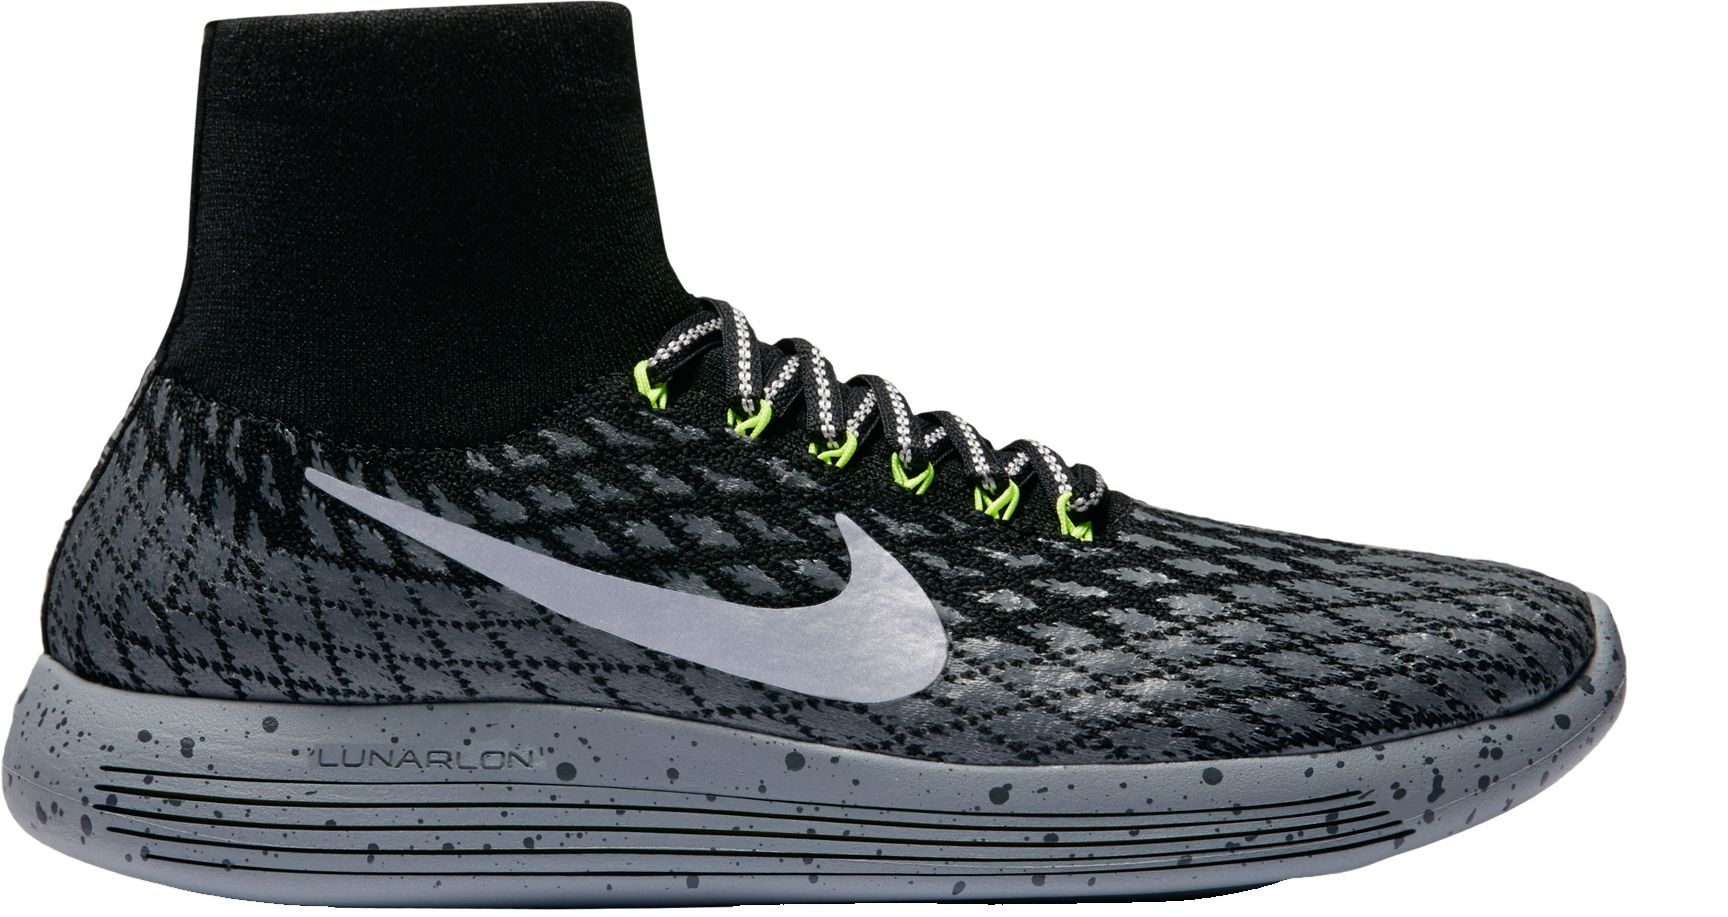 Nike Women's LunarEpic Low Flyknit Shield Running Shoes. 0:00. 0:00 / 0:00.  noImageFound ???